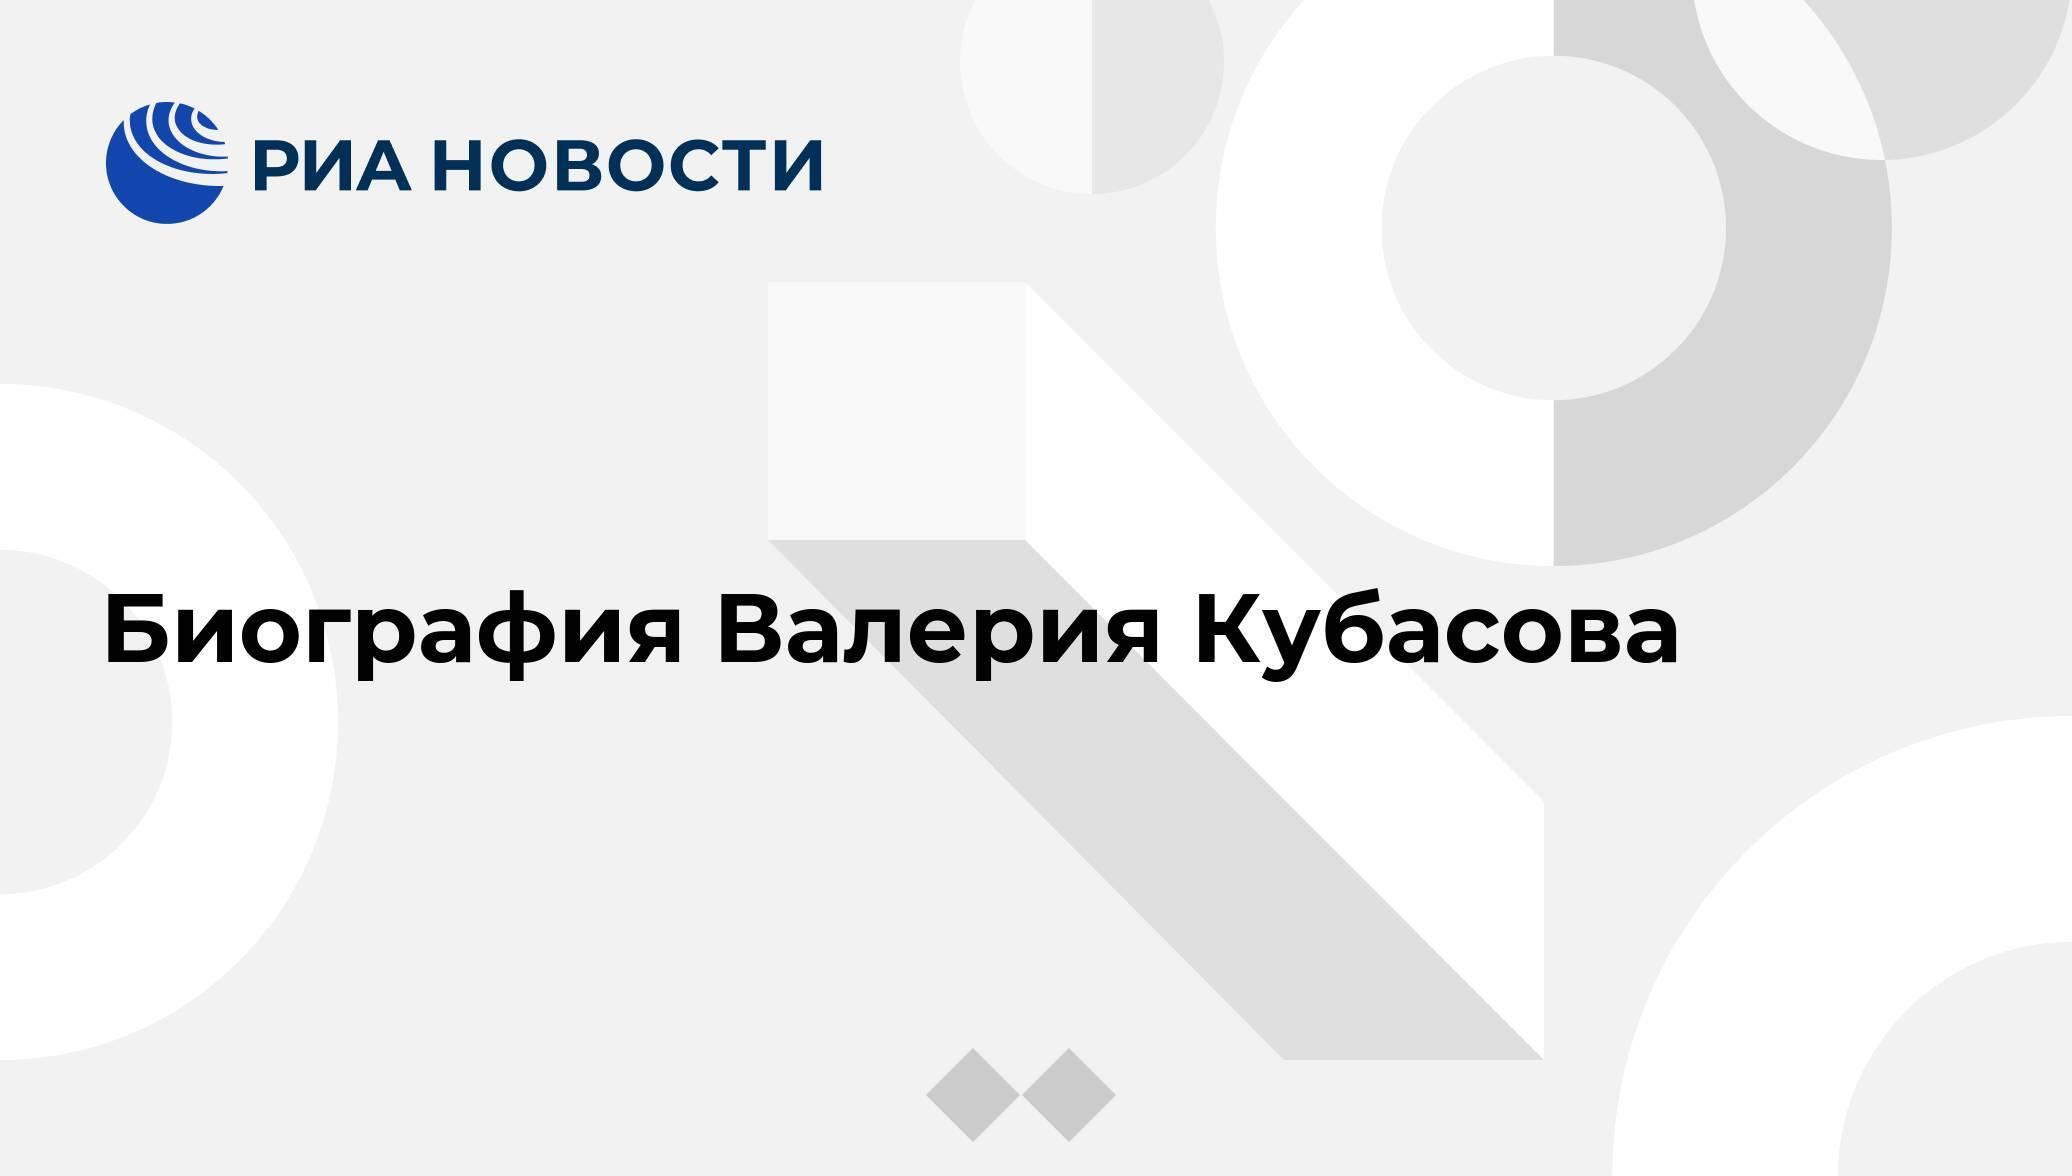 Кубасов, александр семёнович — википедия